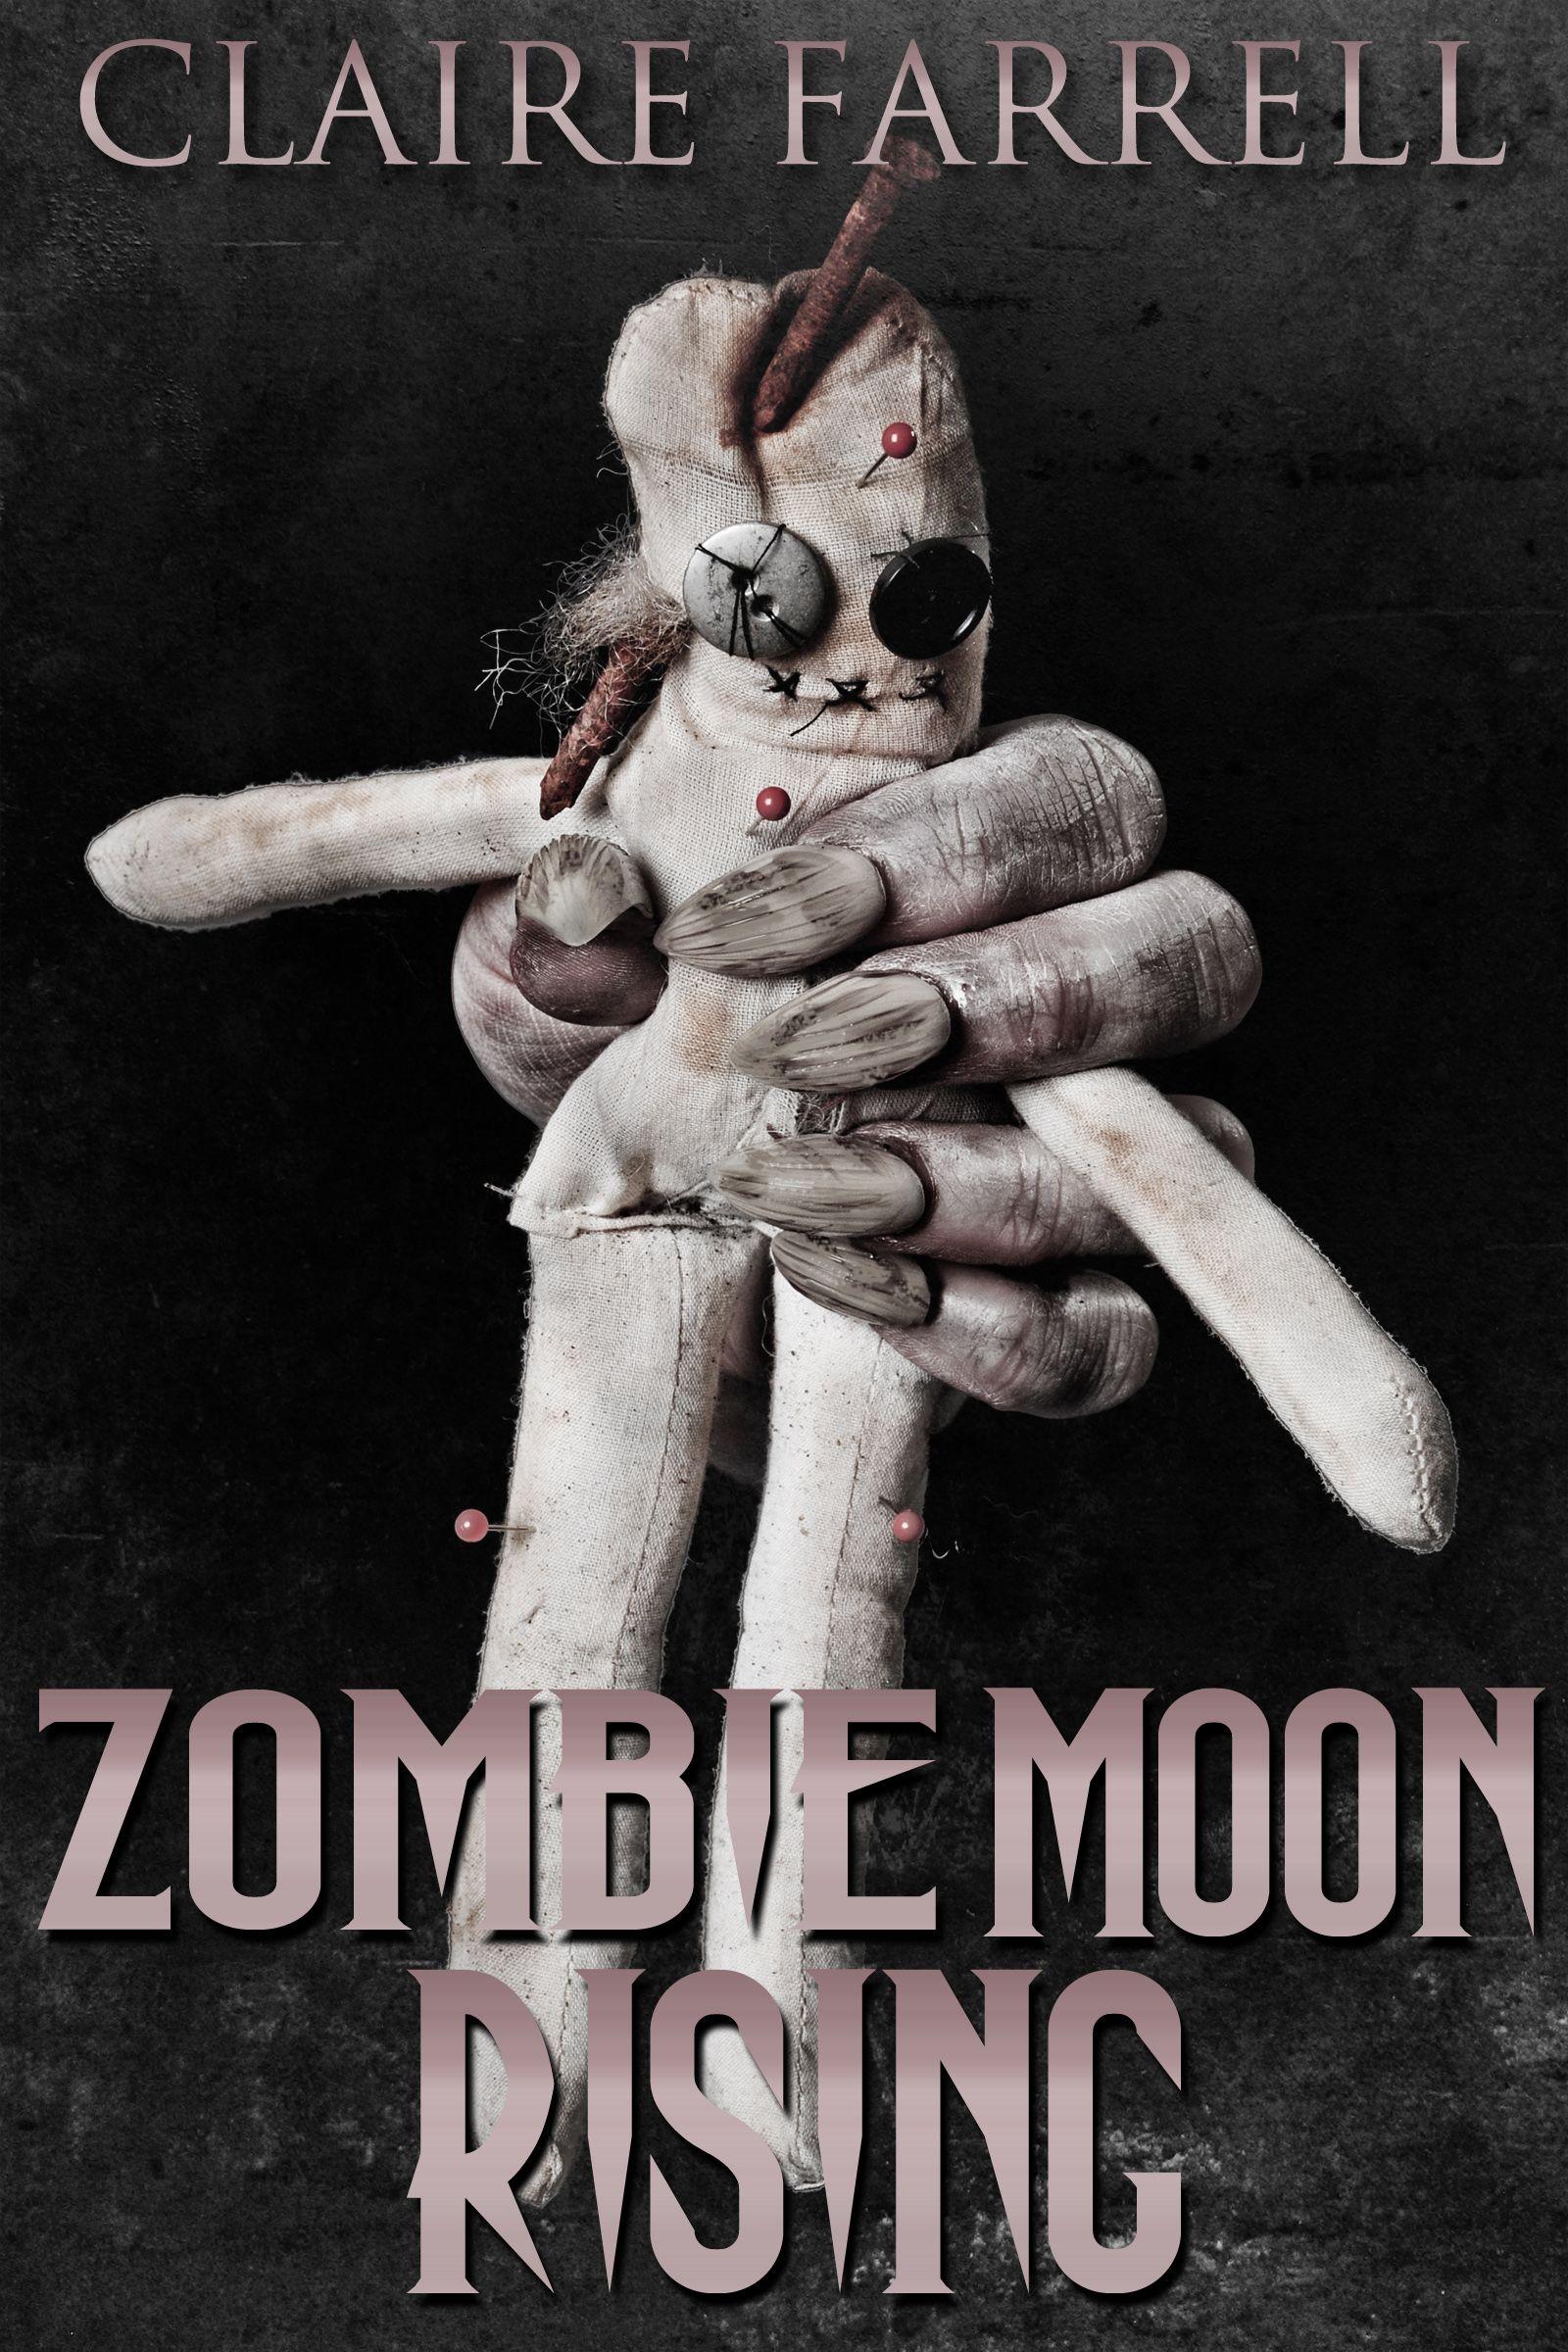 Peter brannigan novella free books moon rise zombie